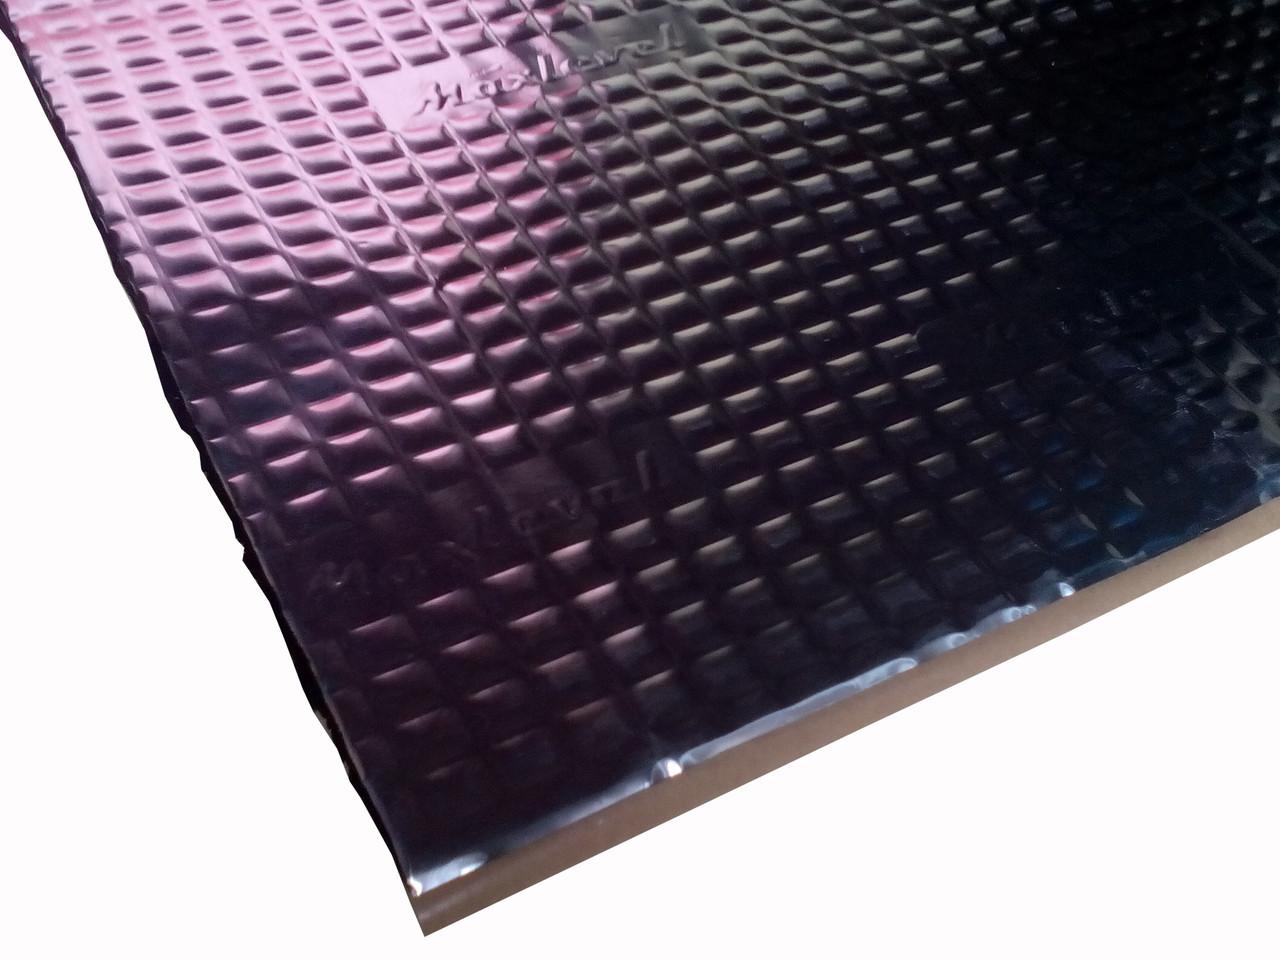 Виброизоляция MaxLevel V1, лист 70см х 50см, толщина - 1.5мм.